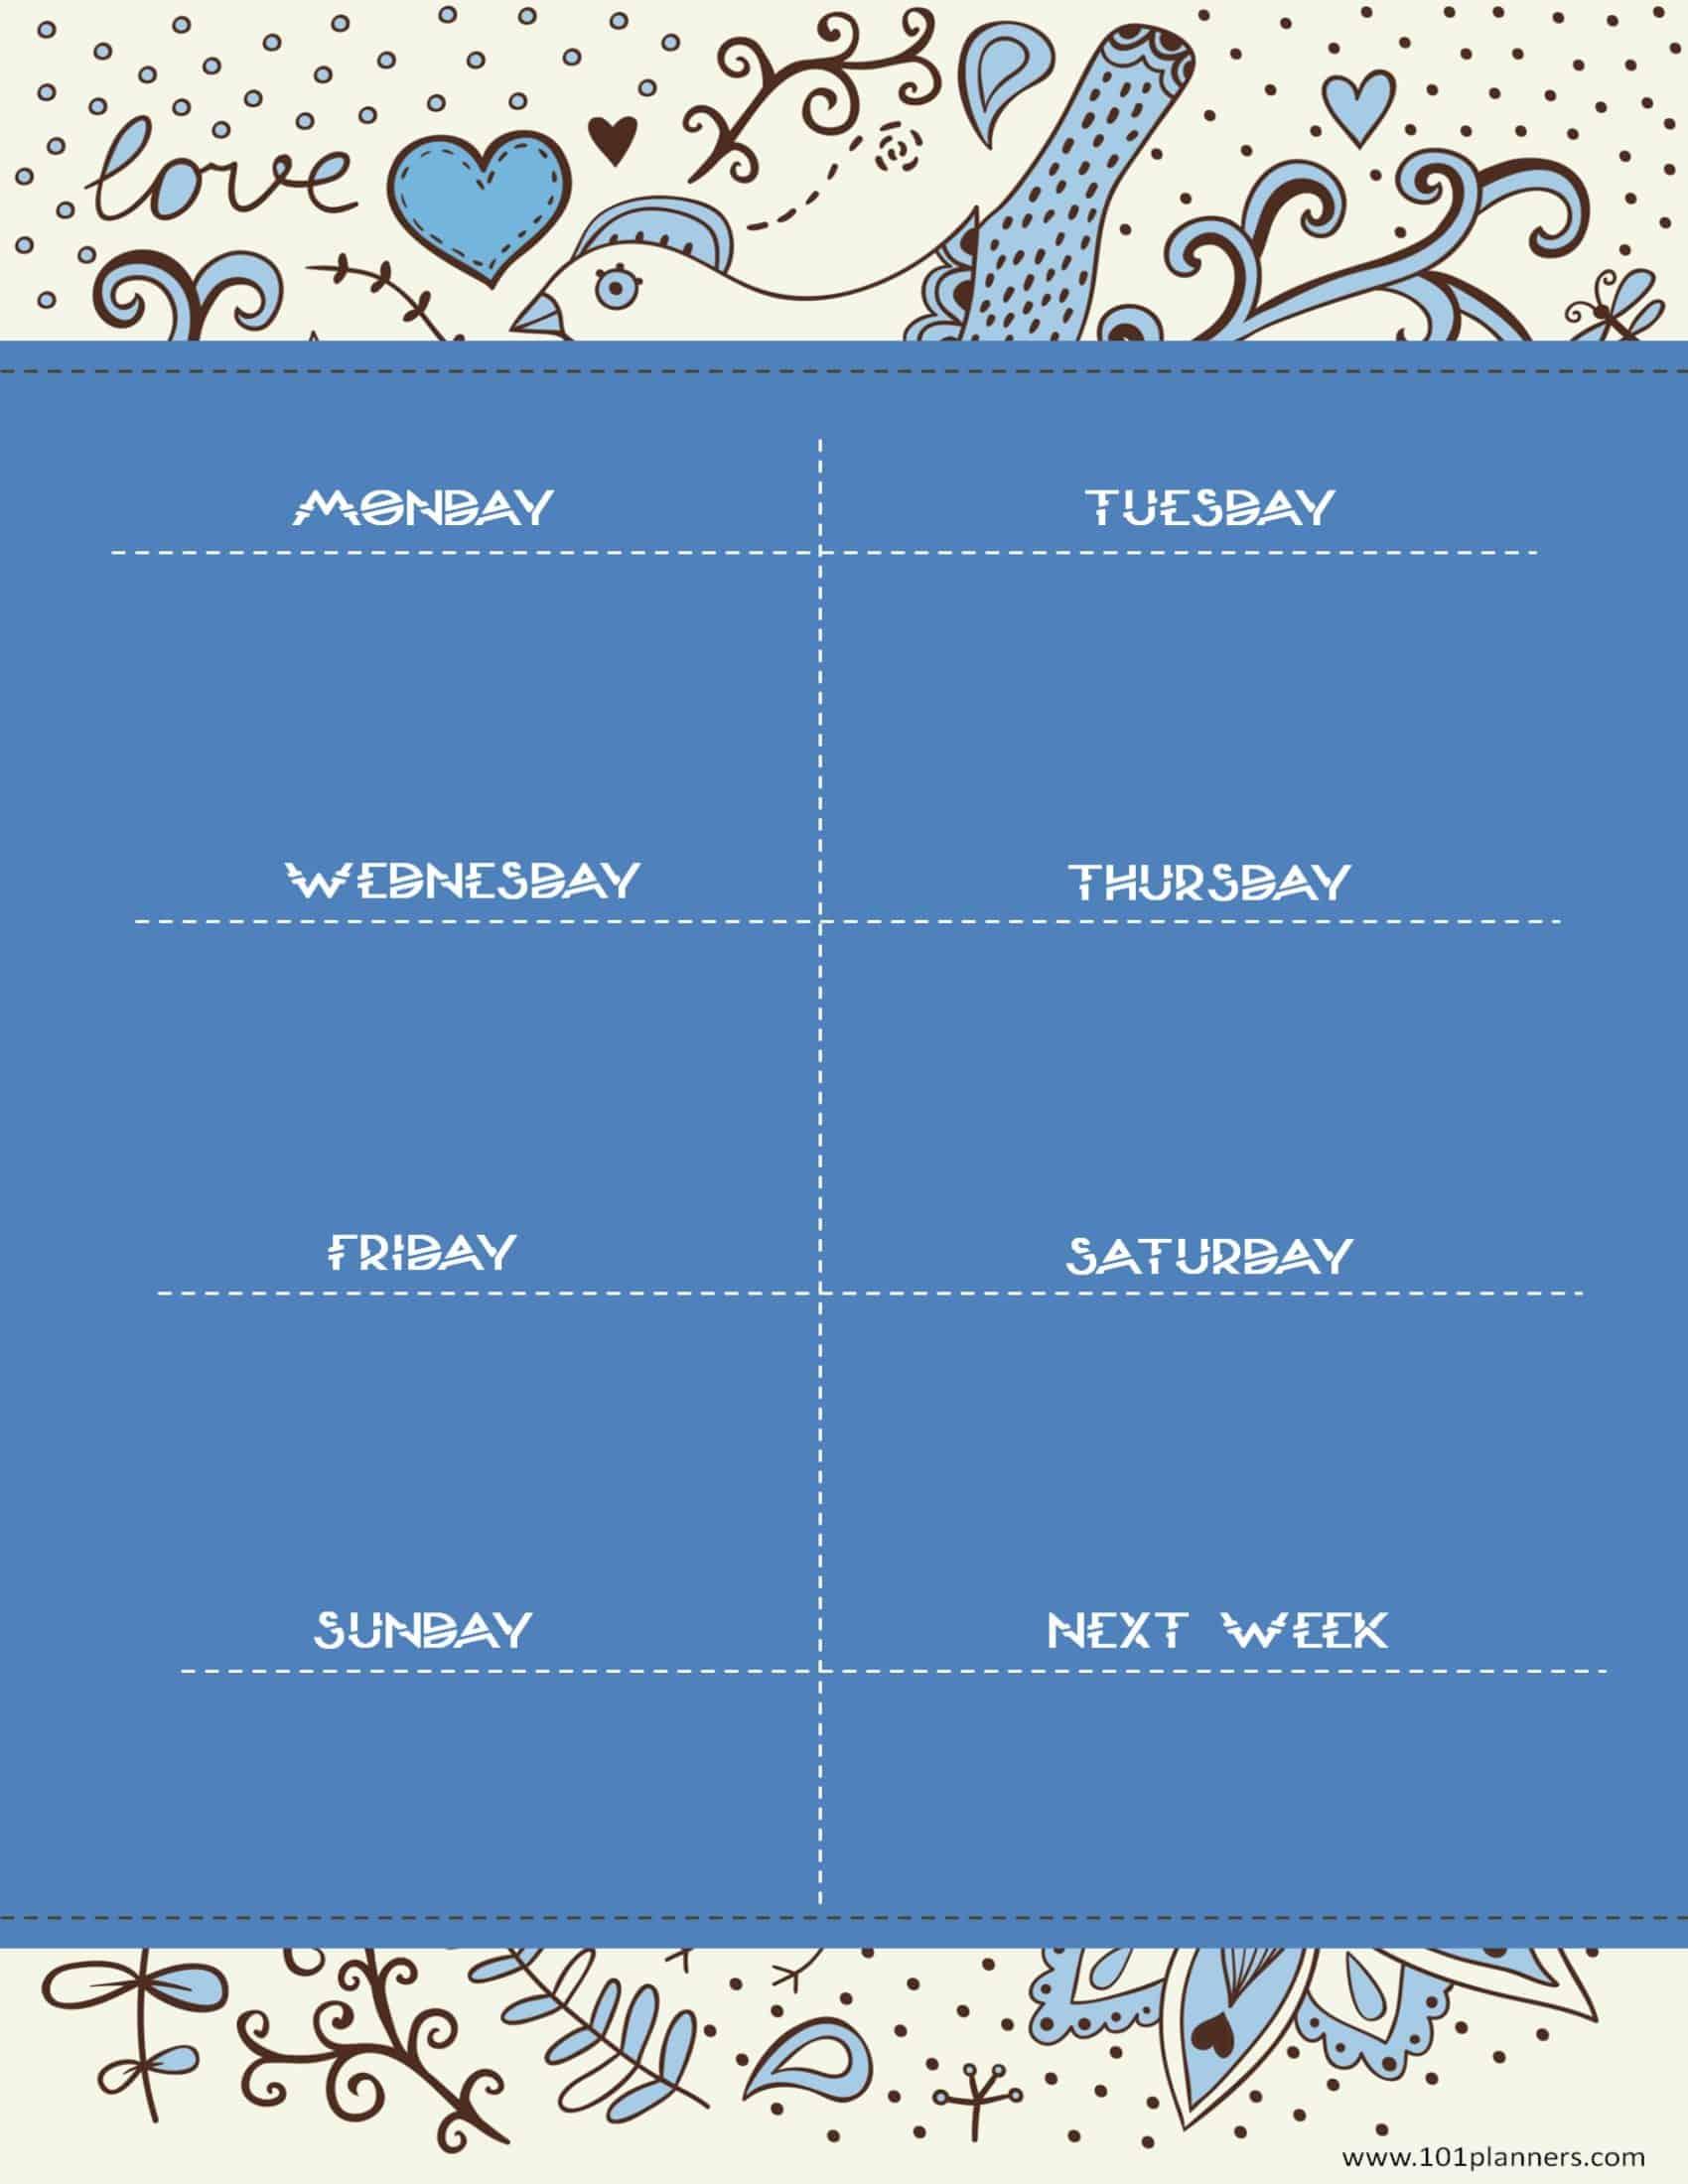 Weekly Calendar Creator : Weekly calendar maker create free custom calendars